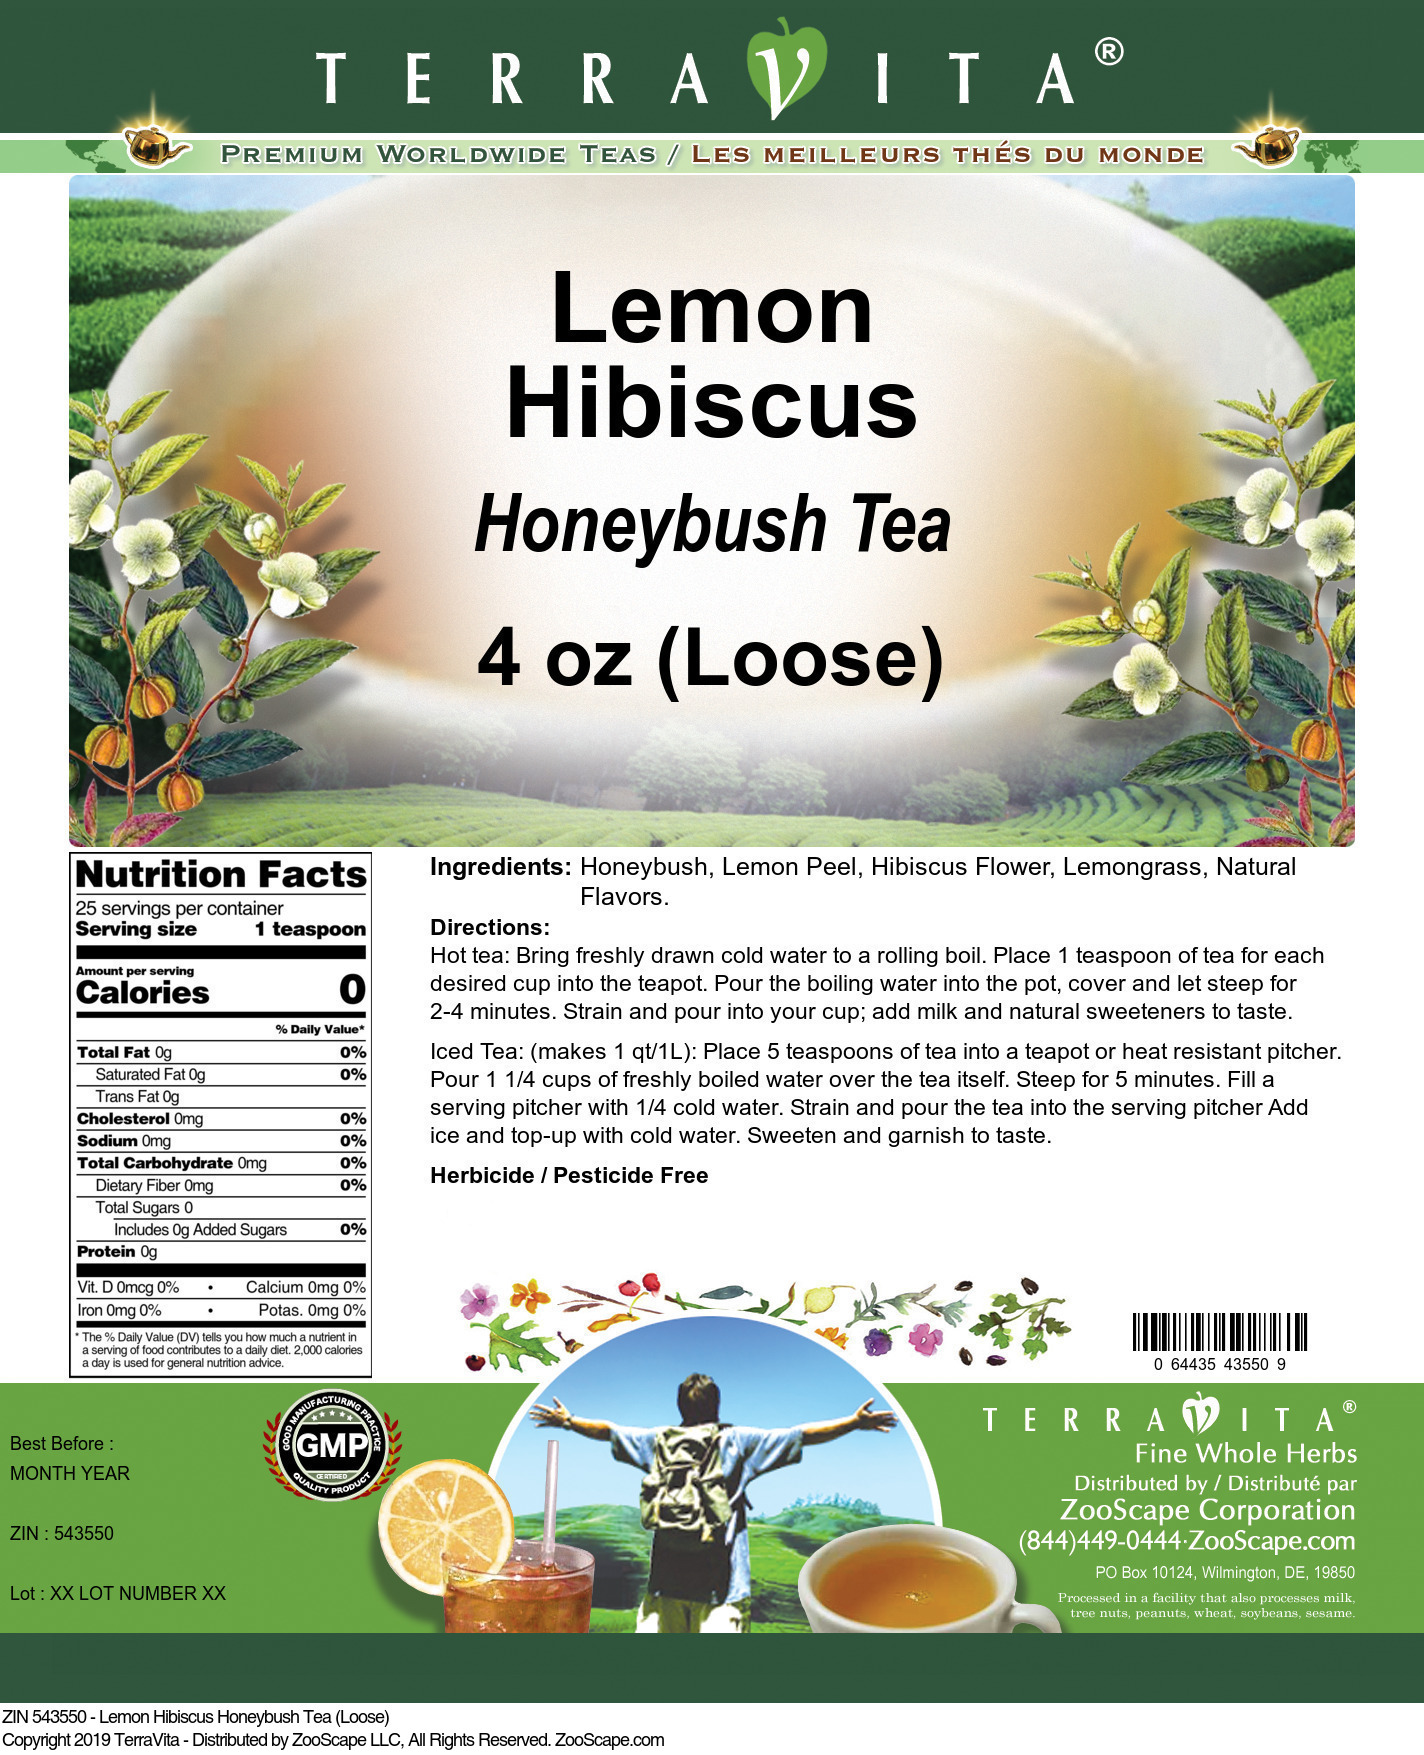 Lemon Hibiscus Honeybush Tea